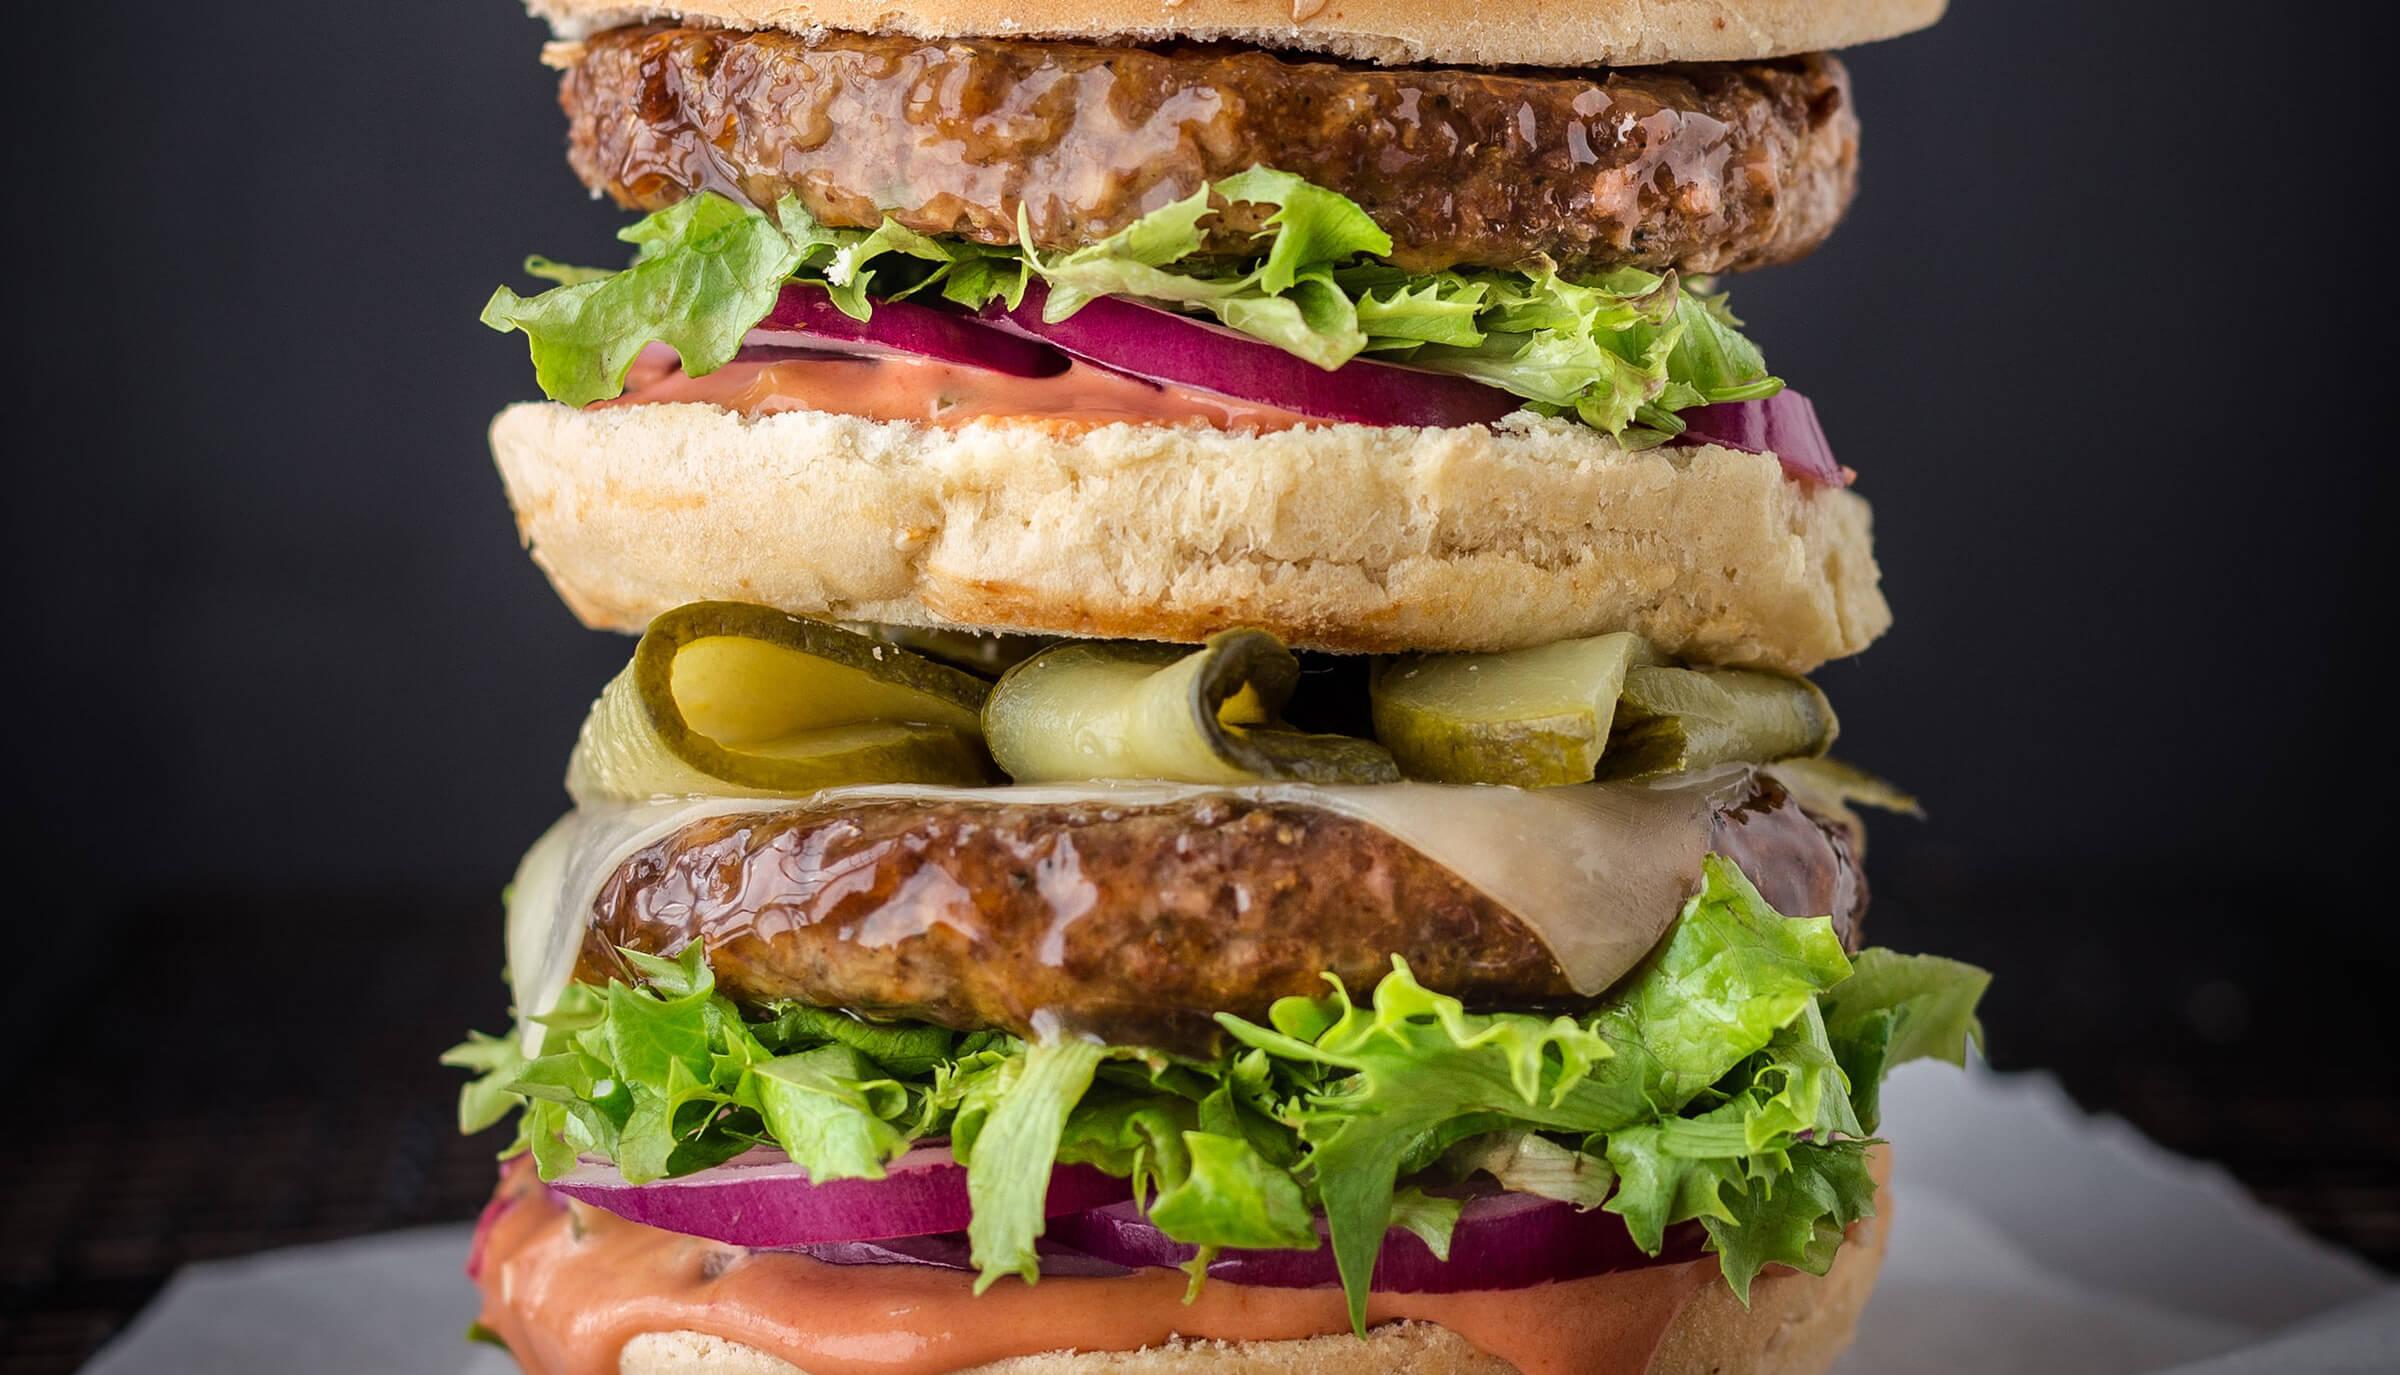 Macfry burger